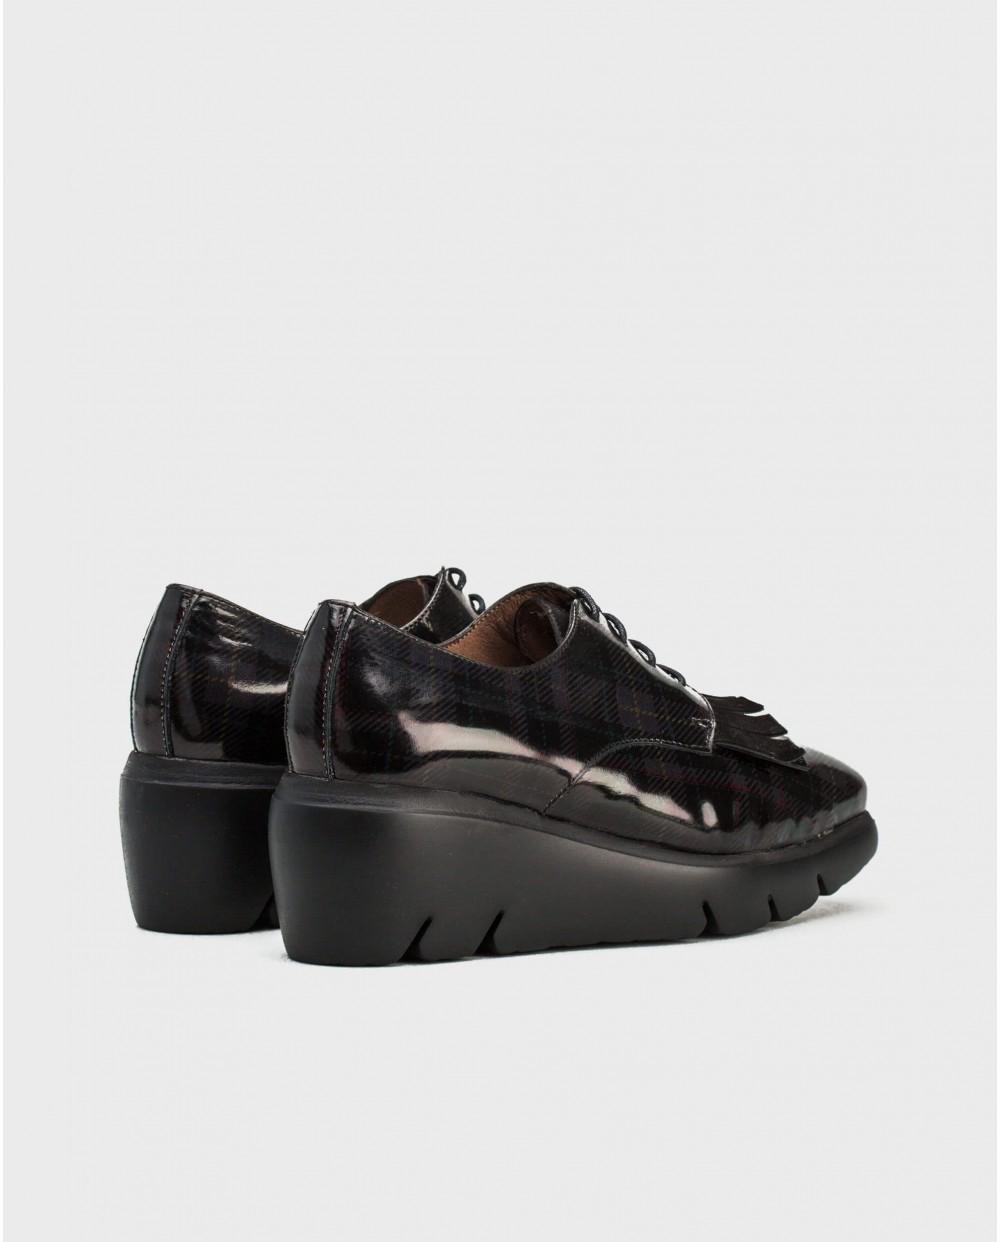 Wonders-Flat Shoes-Bluchers with fringe detail